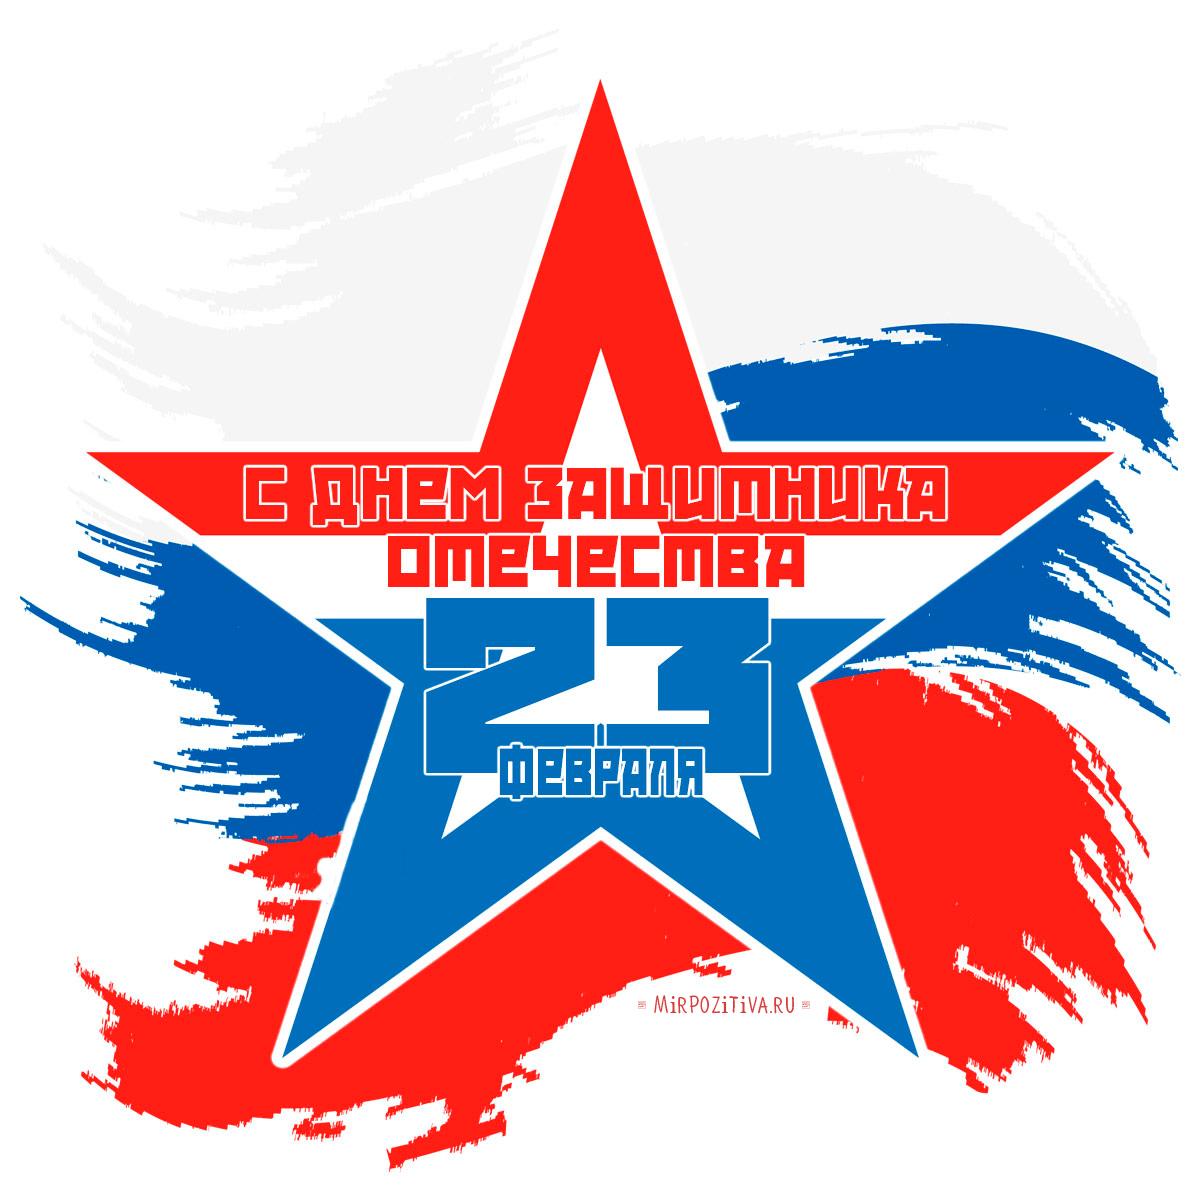 с 23 февраля звезда триколор